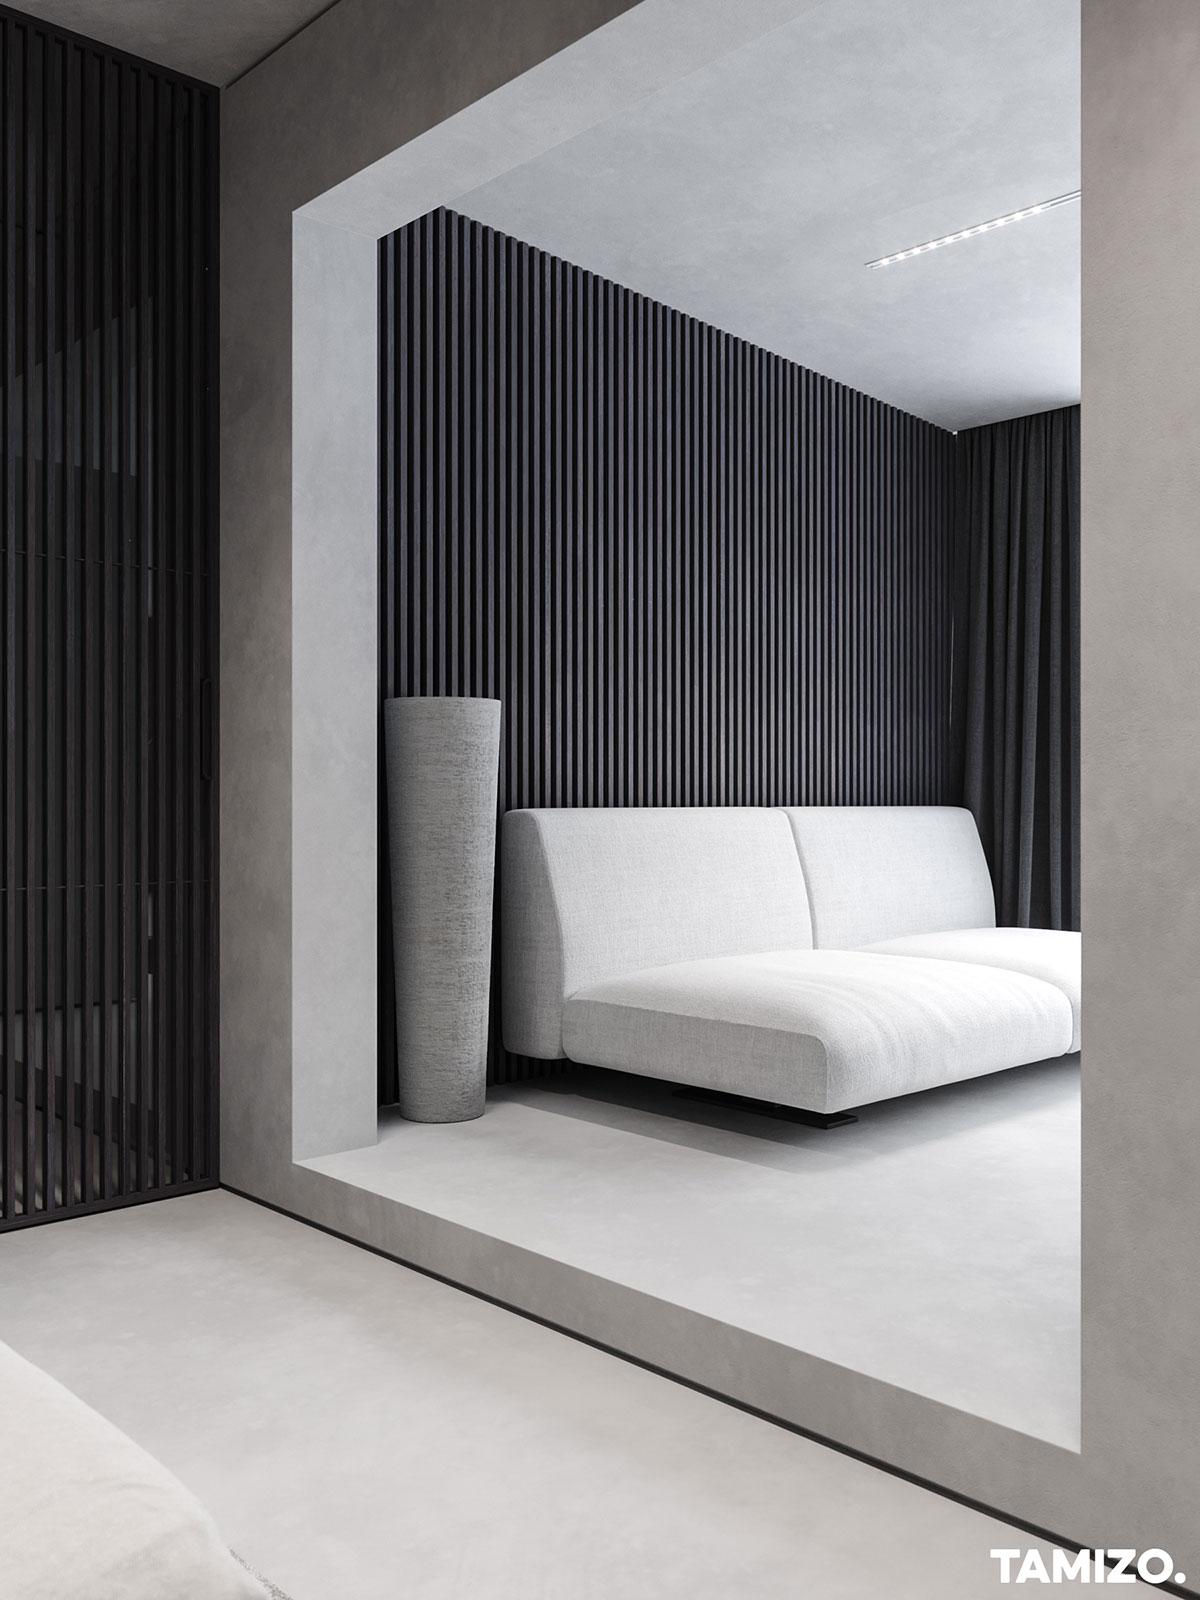 tamizo_architects_mateusz_kuo_stolarski_nice_nicea_france_iterior_design_apartment_16